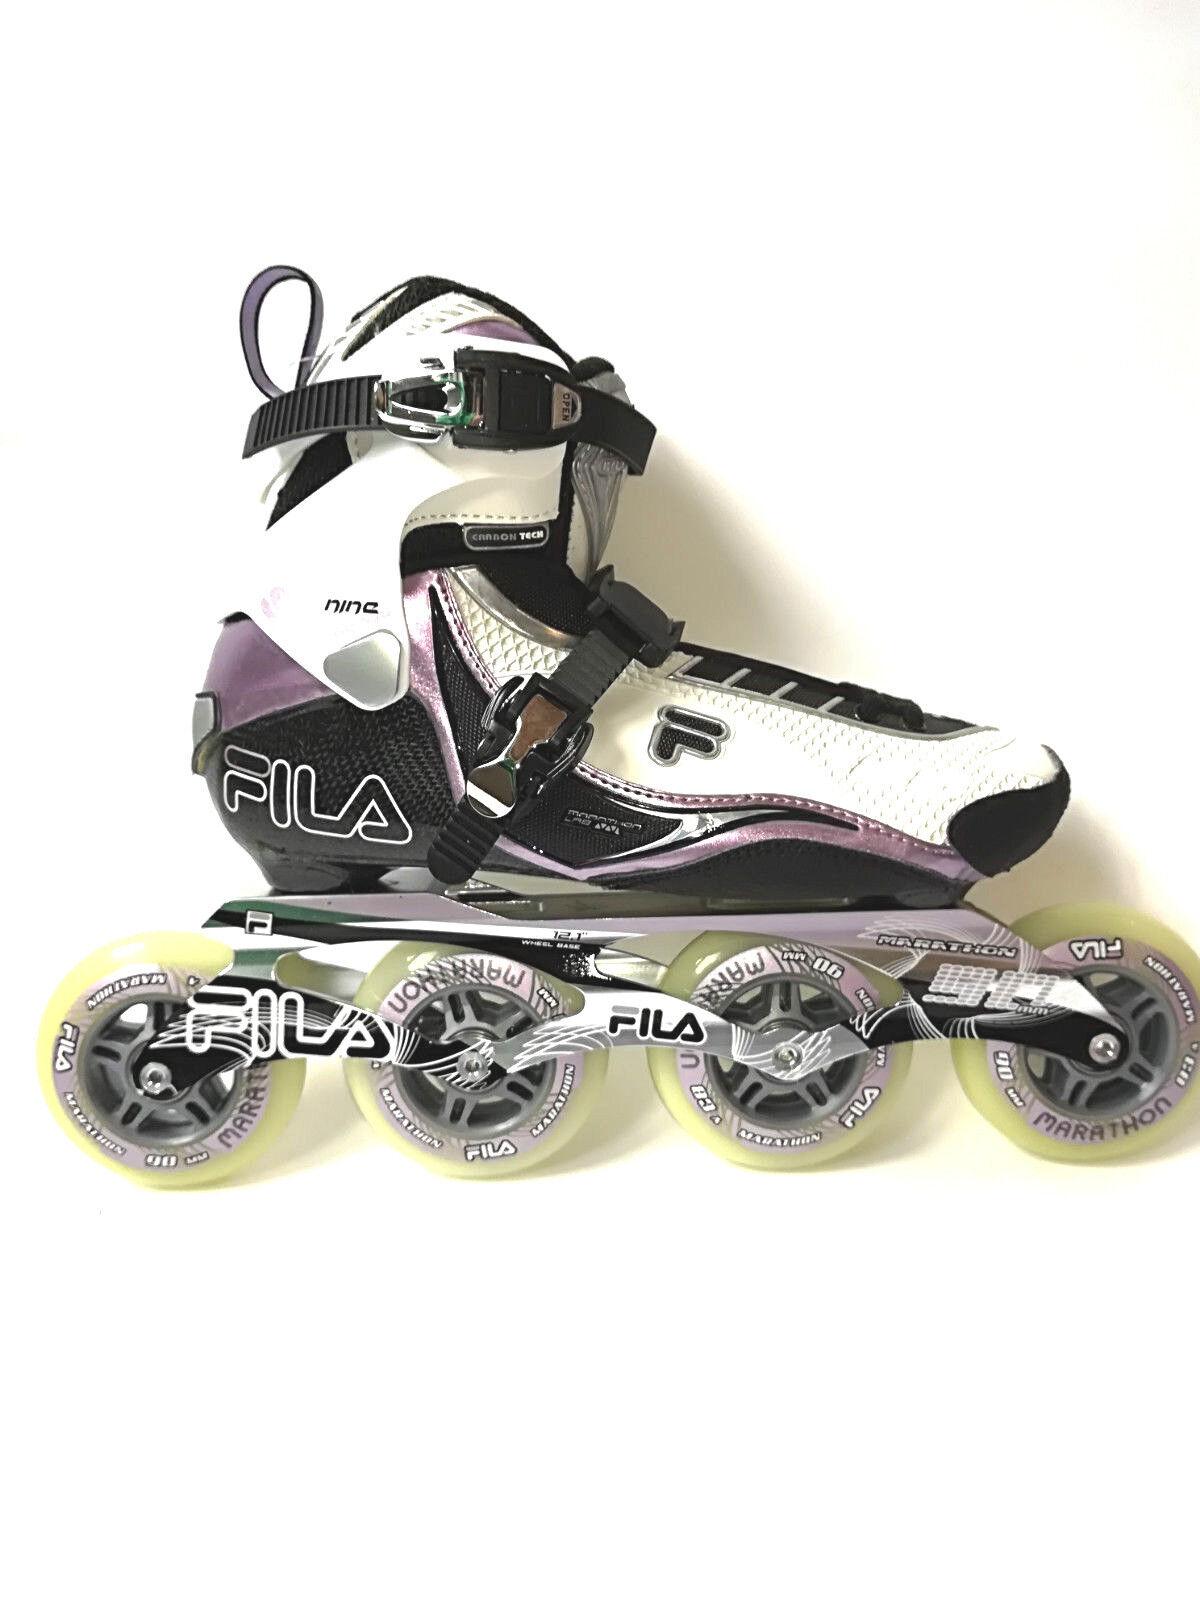 Fila Nine 90 Lady Marathon Weiß lila Marathon Lady  Speedskate Inliner Skates 1025 Gr. 40 56f8c3